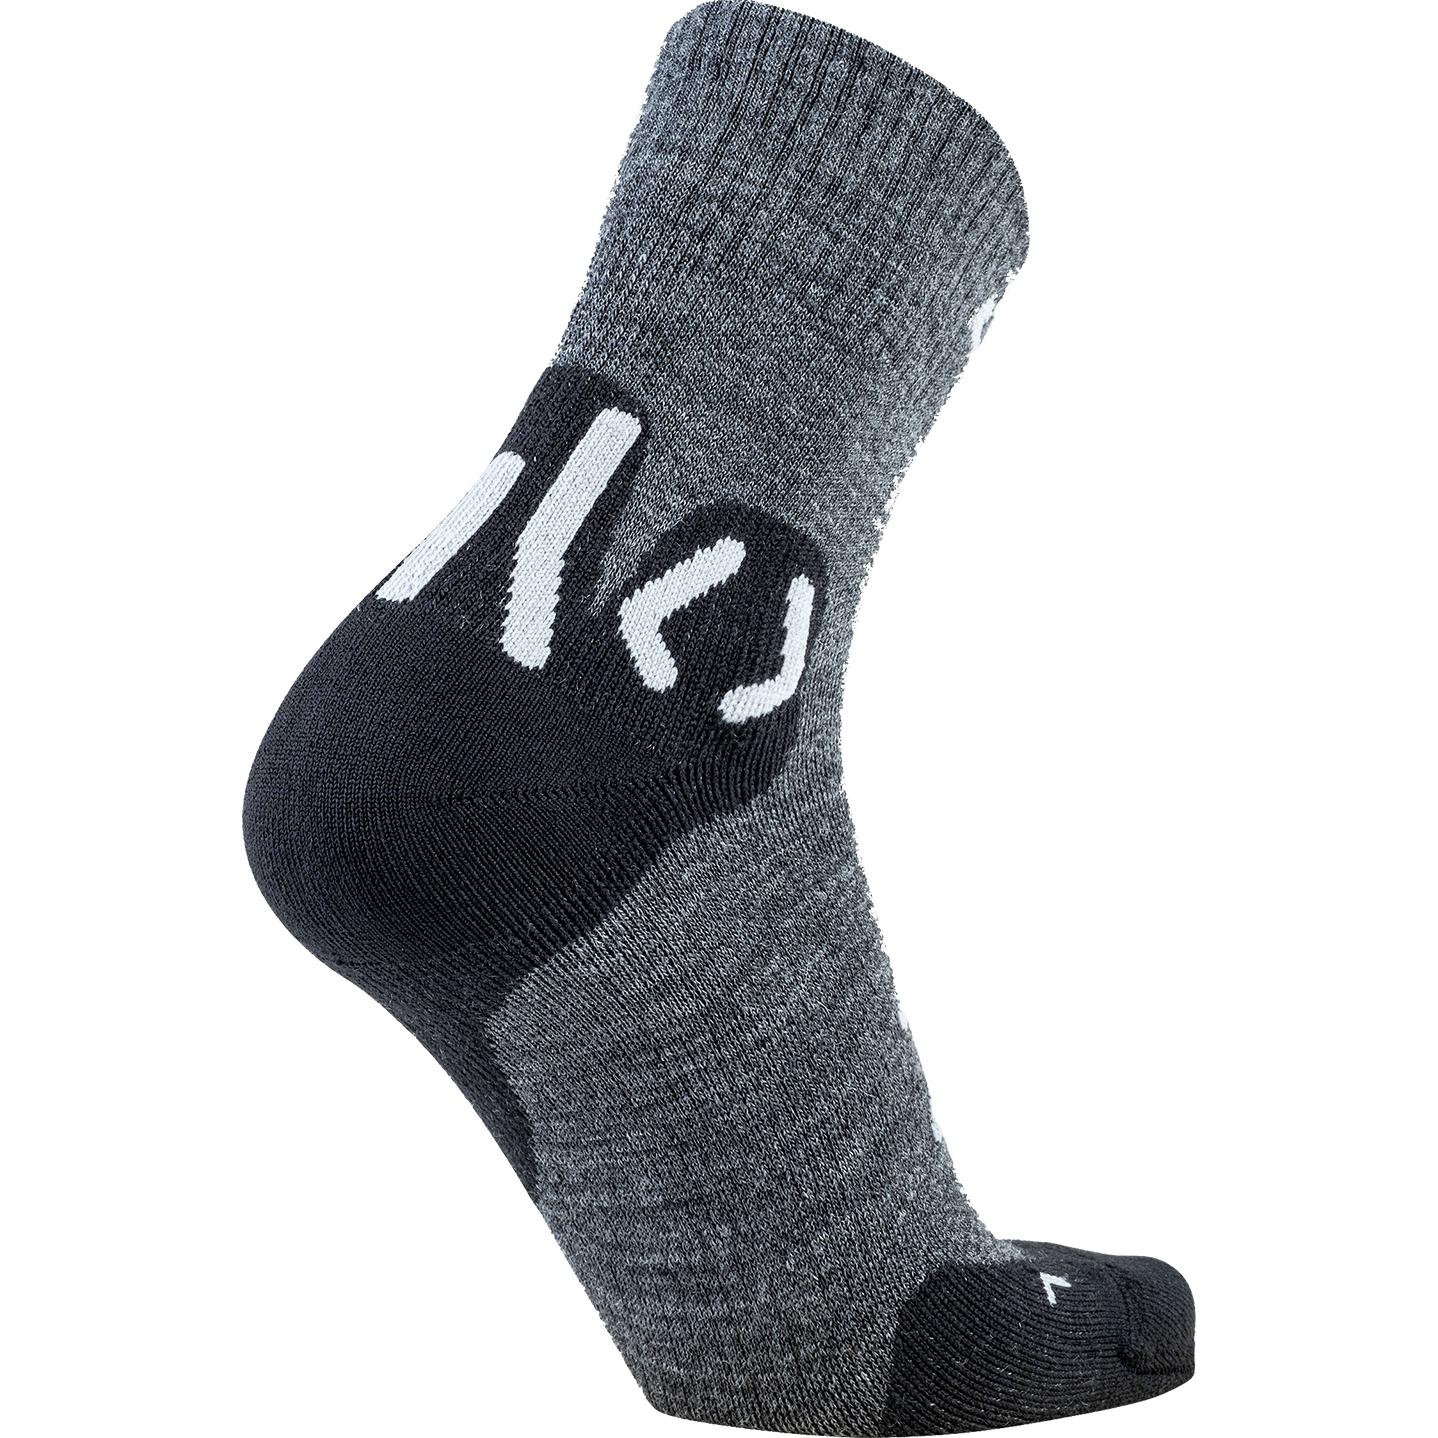 Image of UYN Lady Trekking Approach Merino Mid Cut Socks - Anthracite/Black